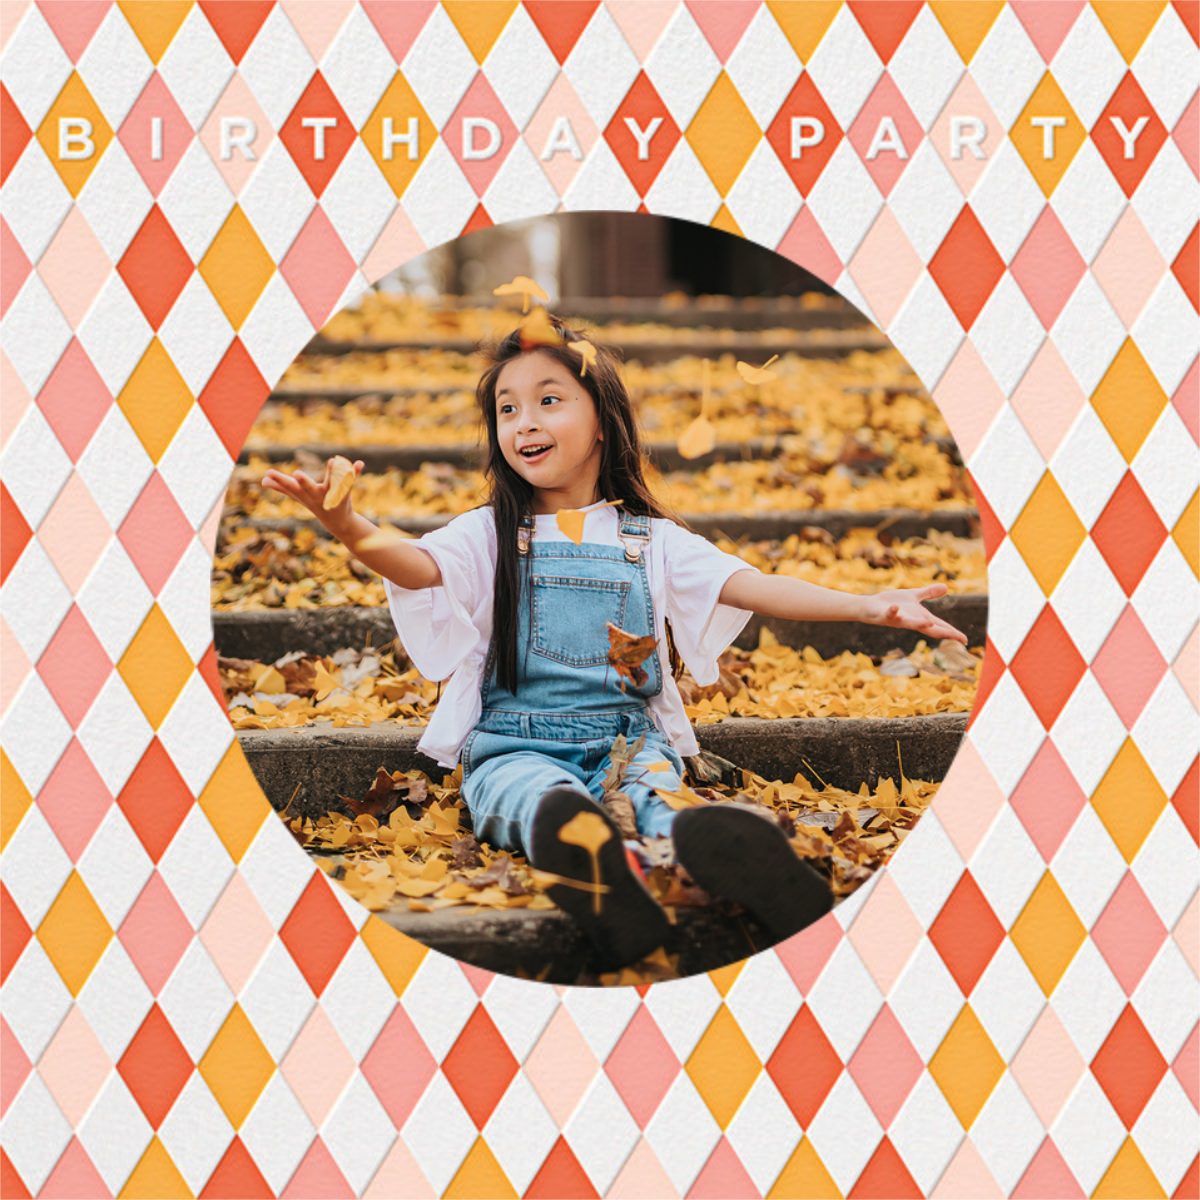 Harlequin - Pink - Petit Collage - Kids' birthday